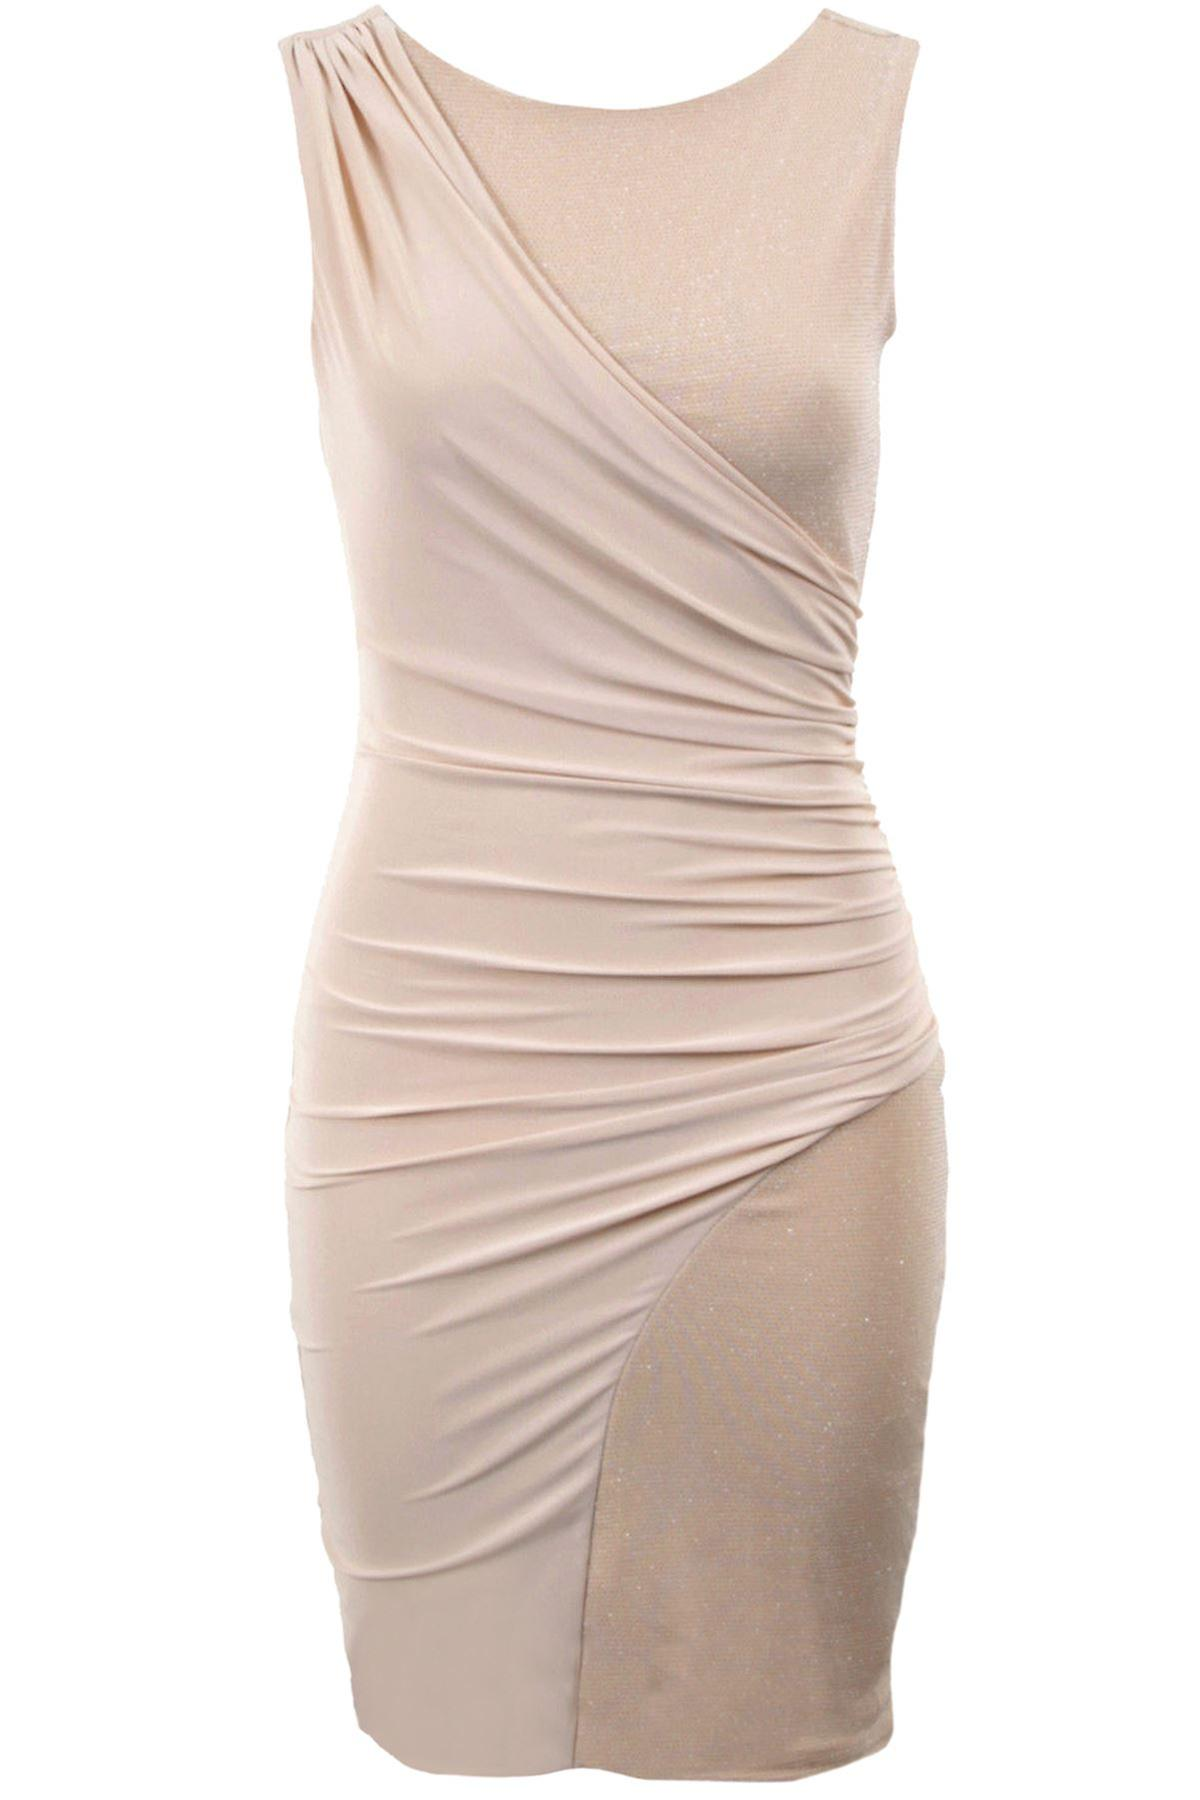 Ladies Silver Glitter Diagonal Wrap Bodycon Womens Short Party Evening Dress